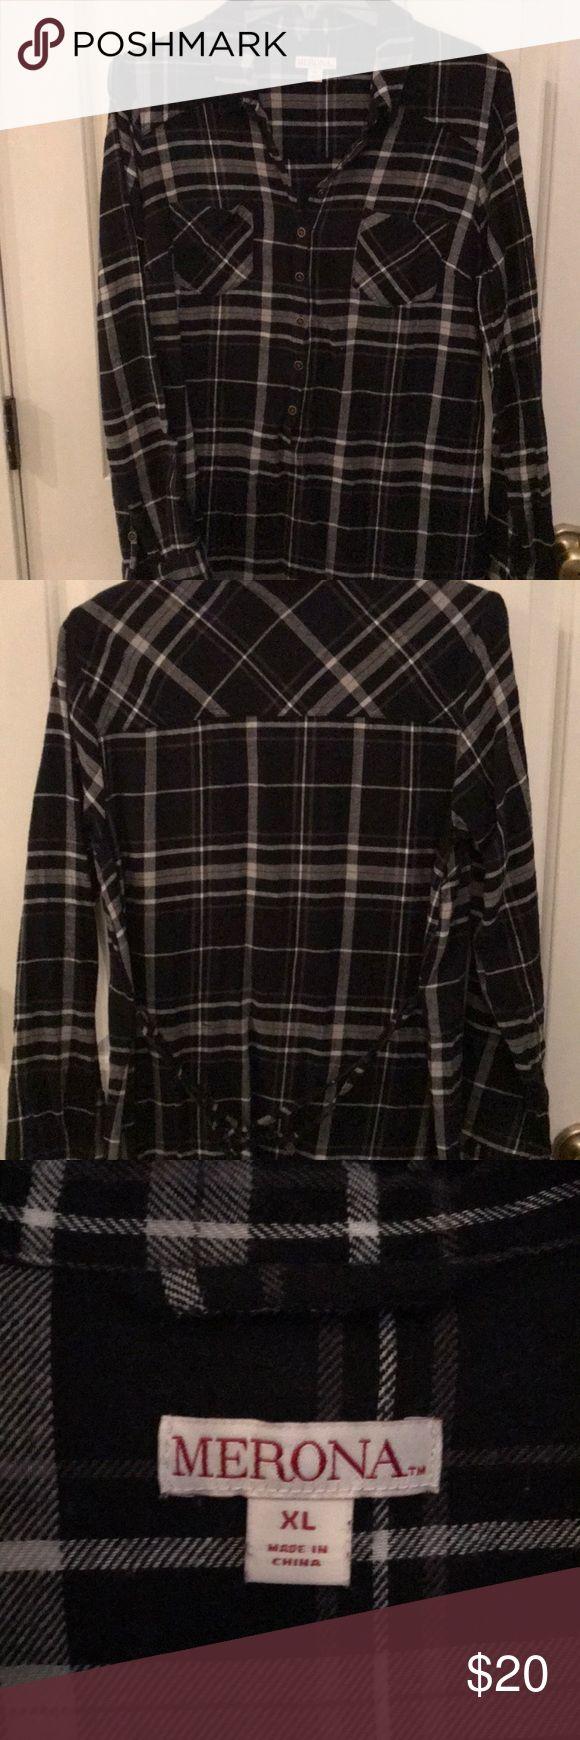 Merona Flannel Shirt Dress Black and White plaid Merona flannel shirt dress.  Worn once for family pics ❤️ super cute, warm and comfy. Merona Dresses Midi